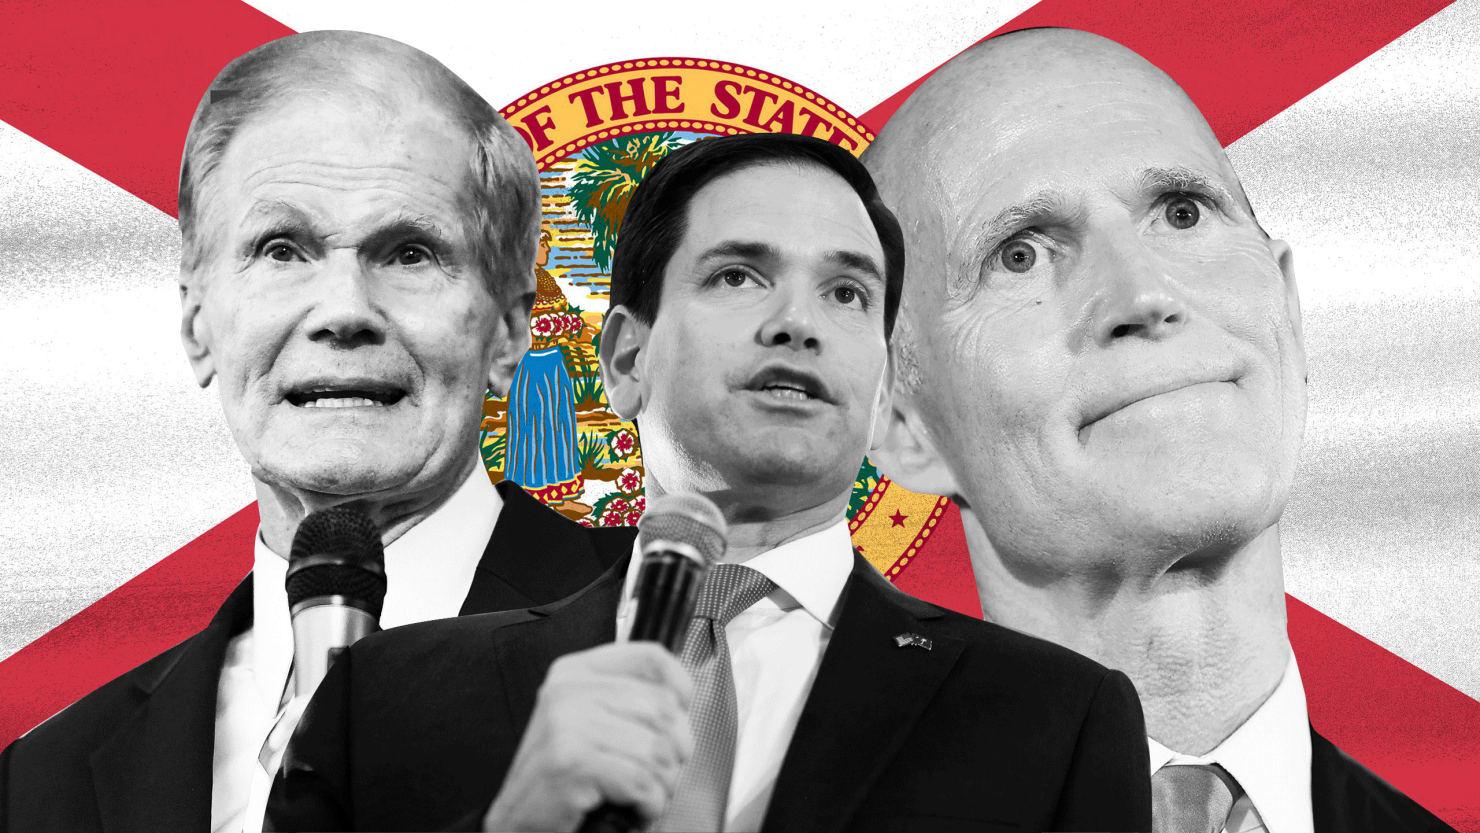 Republicans Freak Out as New Ballots Threaten Florida Senate Win